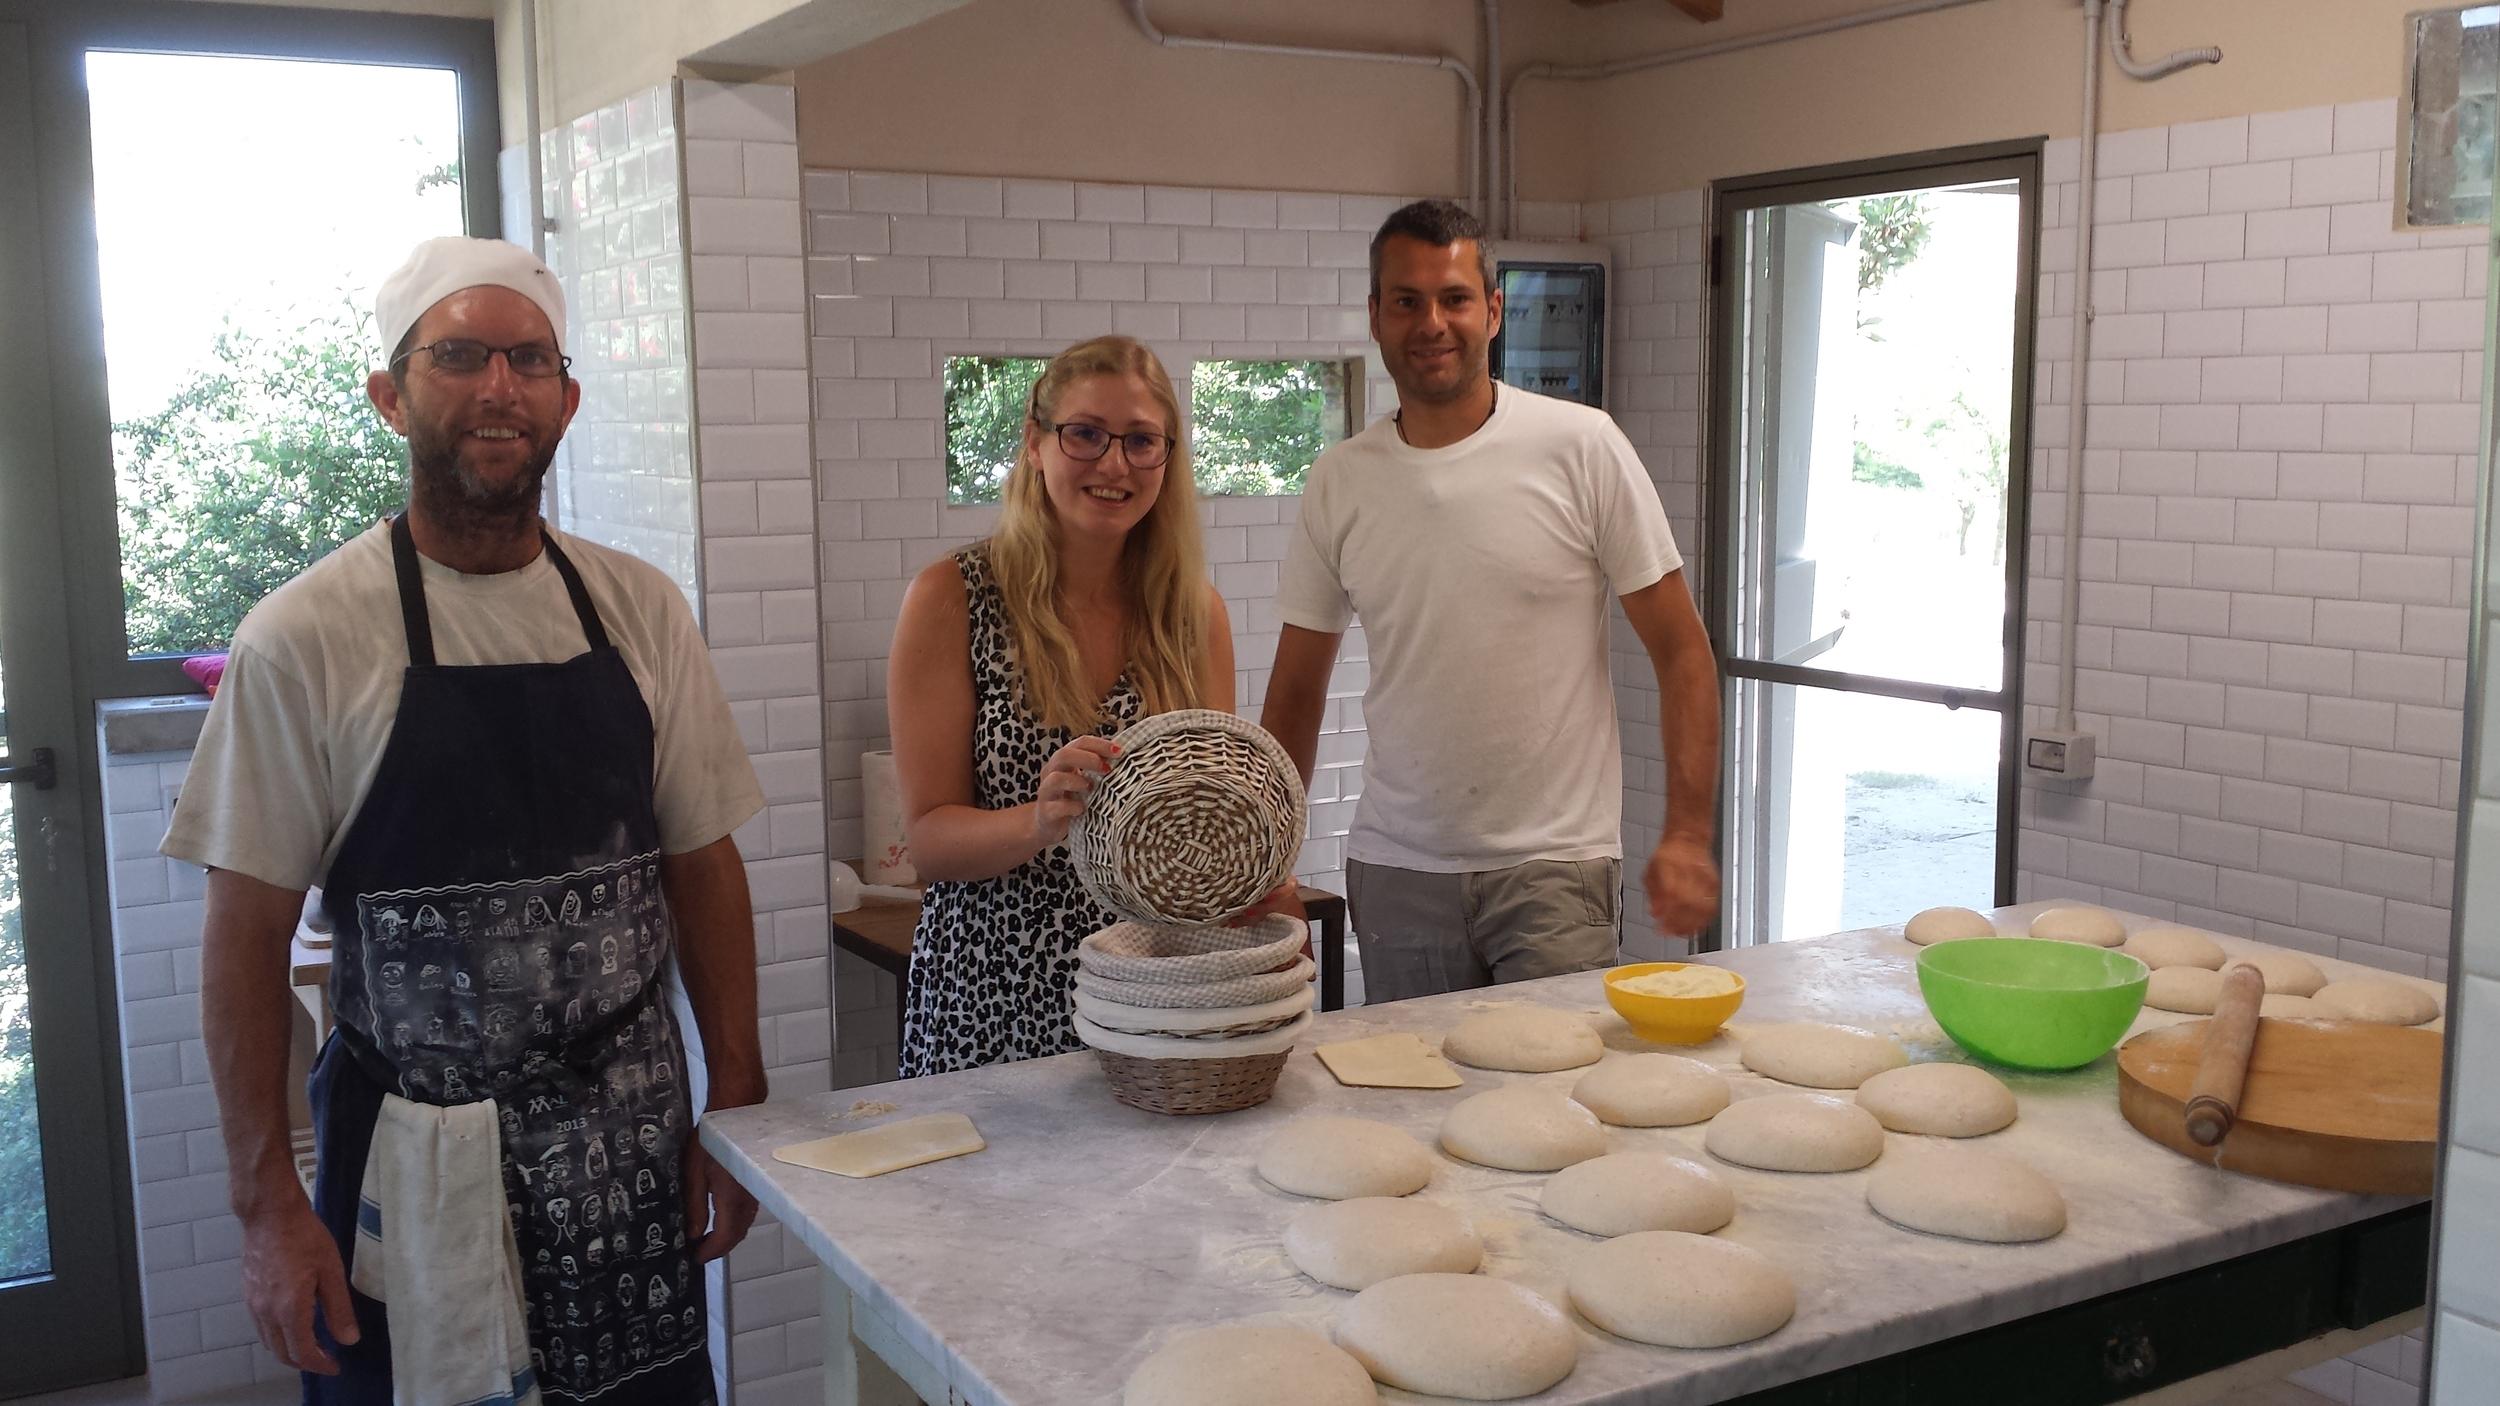 Barbialla-bread-lesson-Ken-Hercott